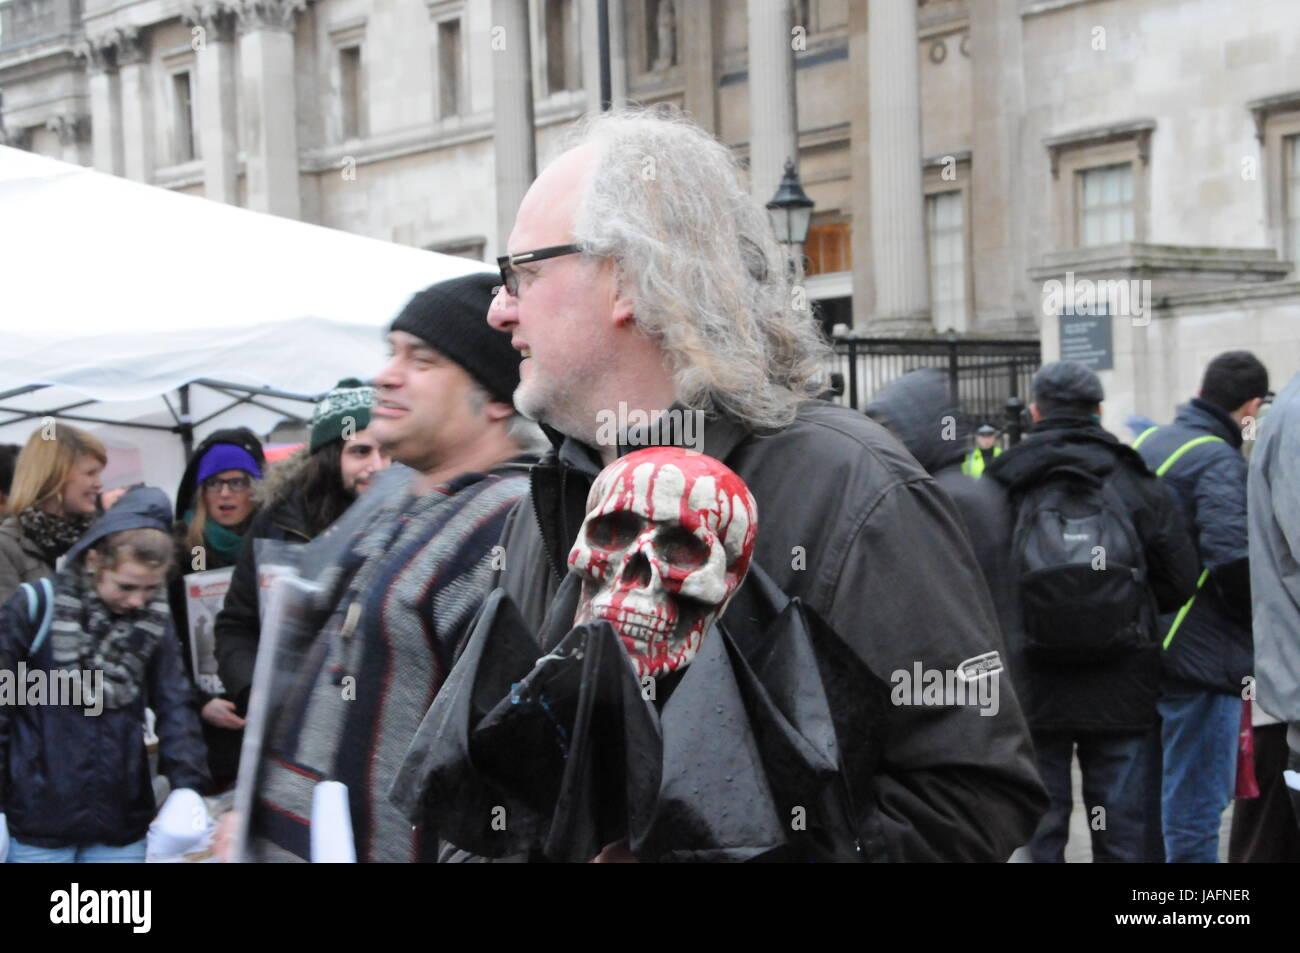 Anti-Margaret Thatcher Demonstration in London. - Stock Image